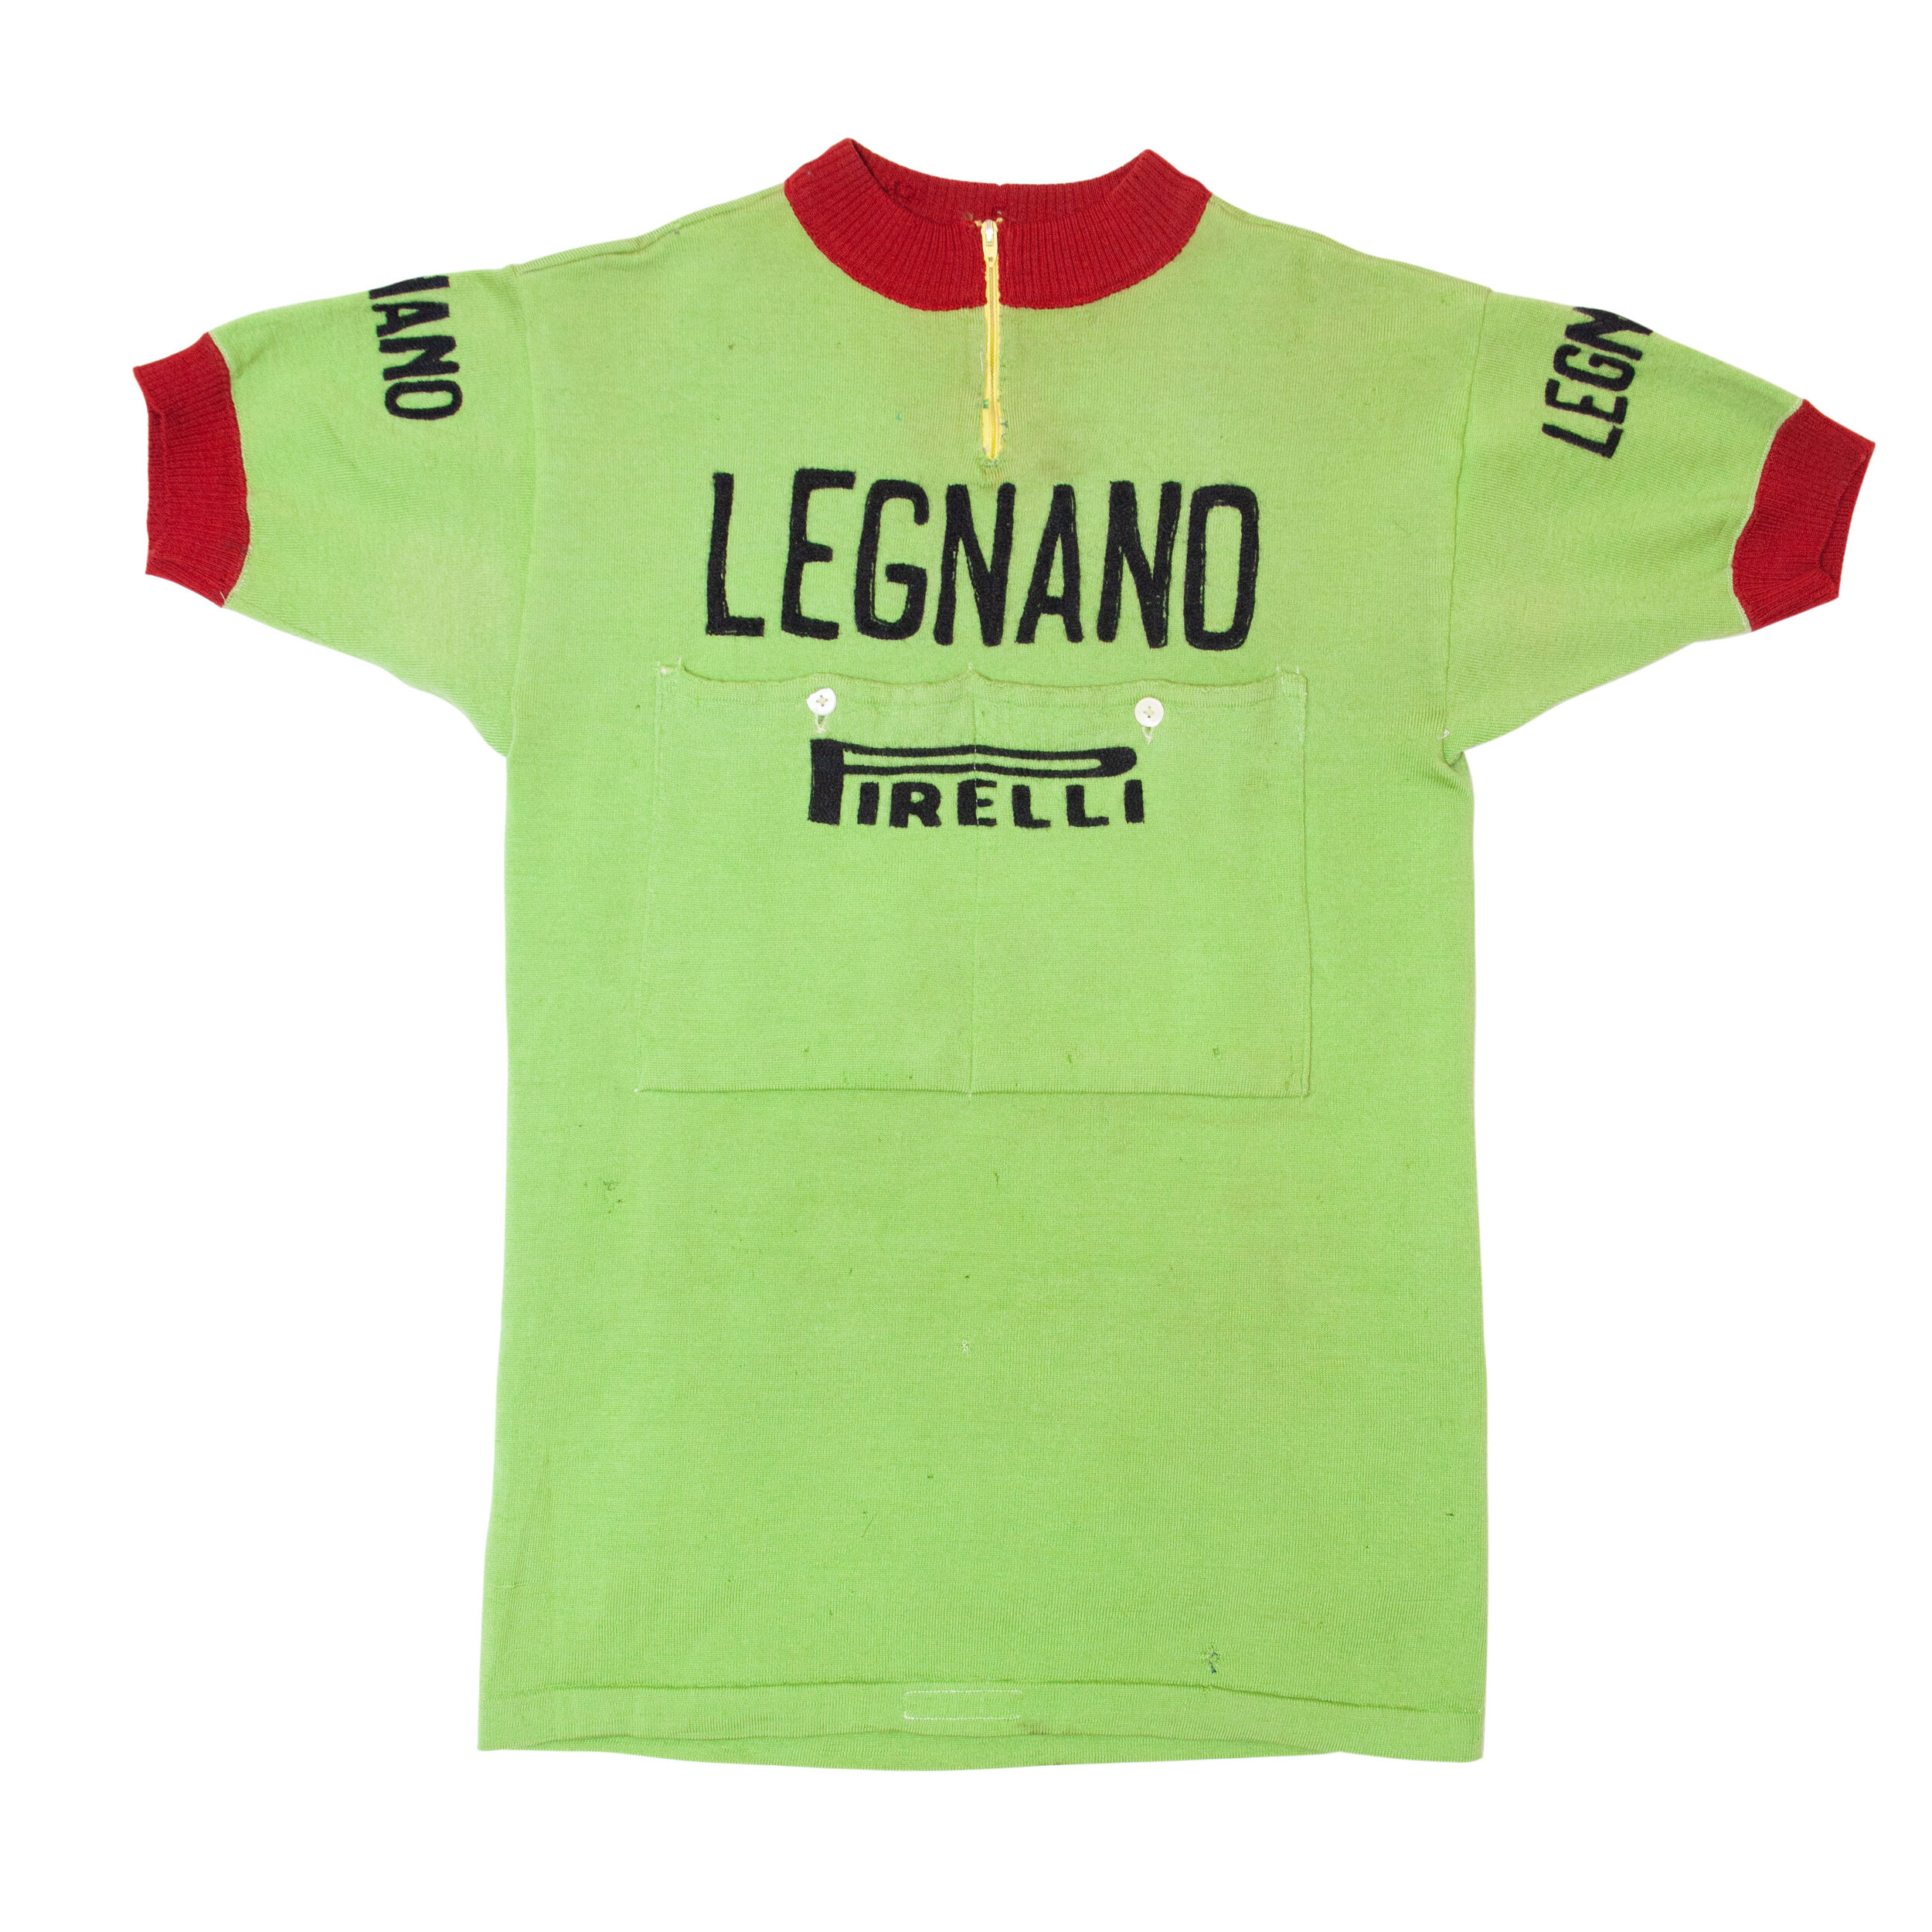 Legnano---Pirelli-1962.jpg